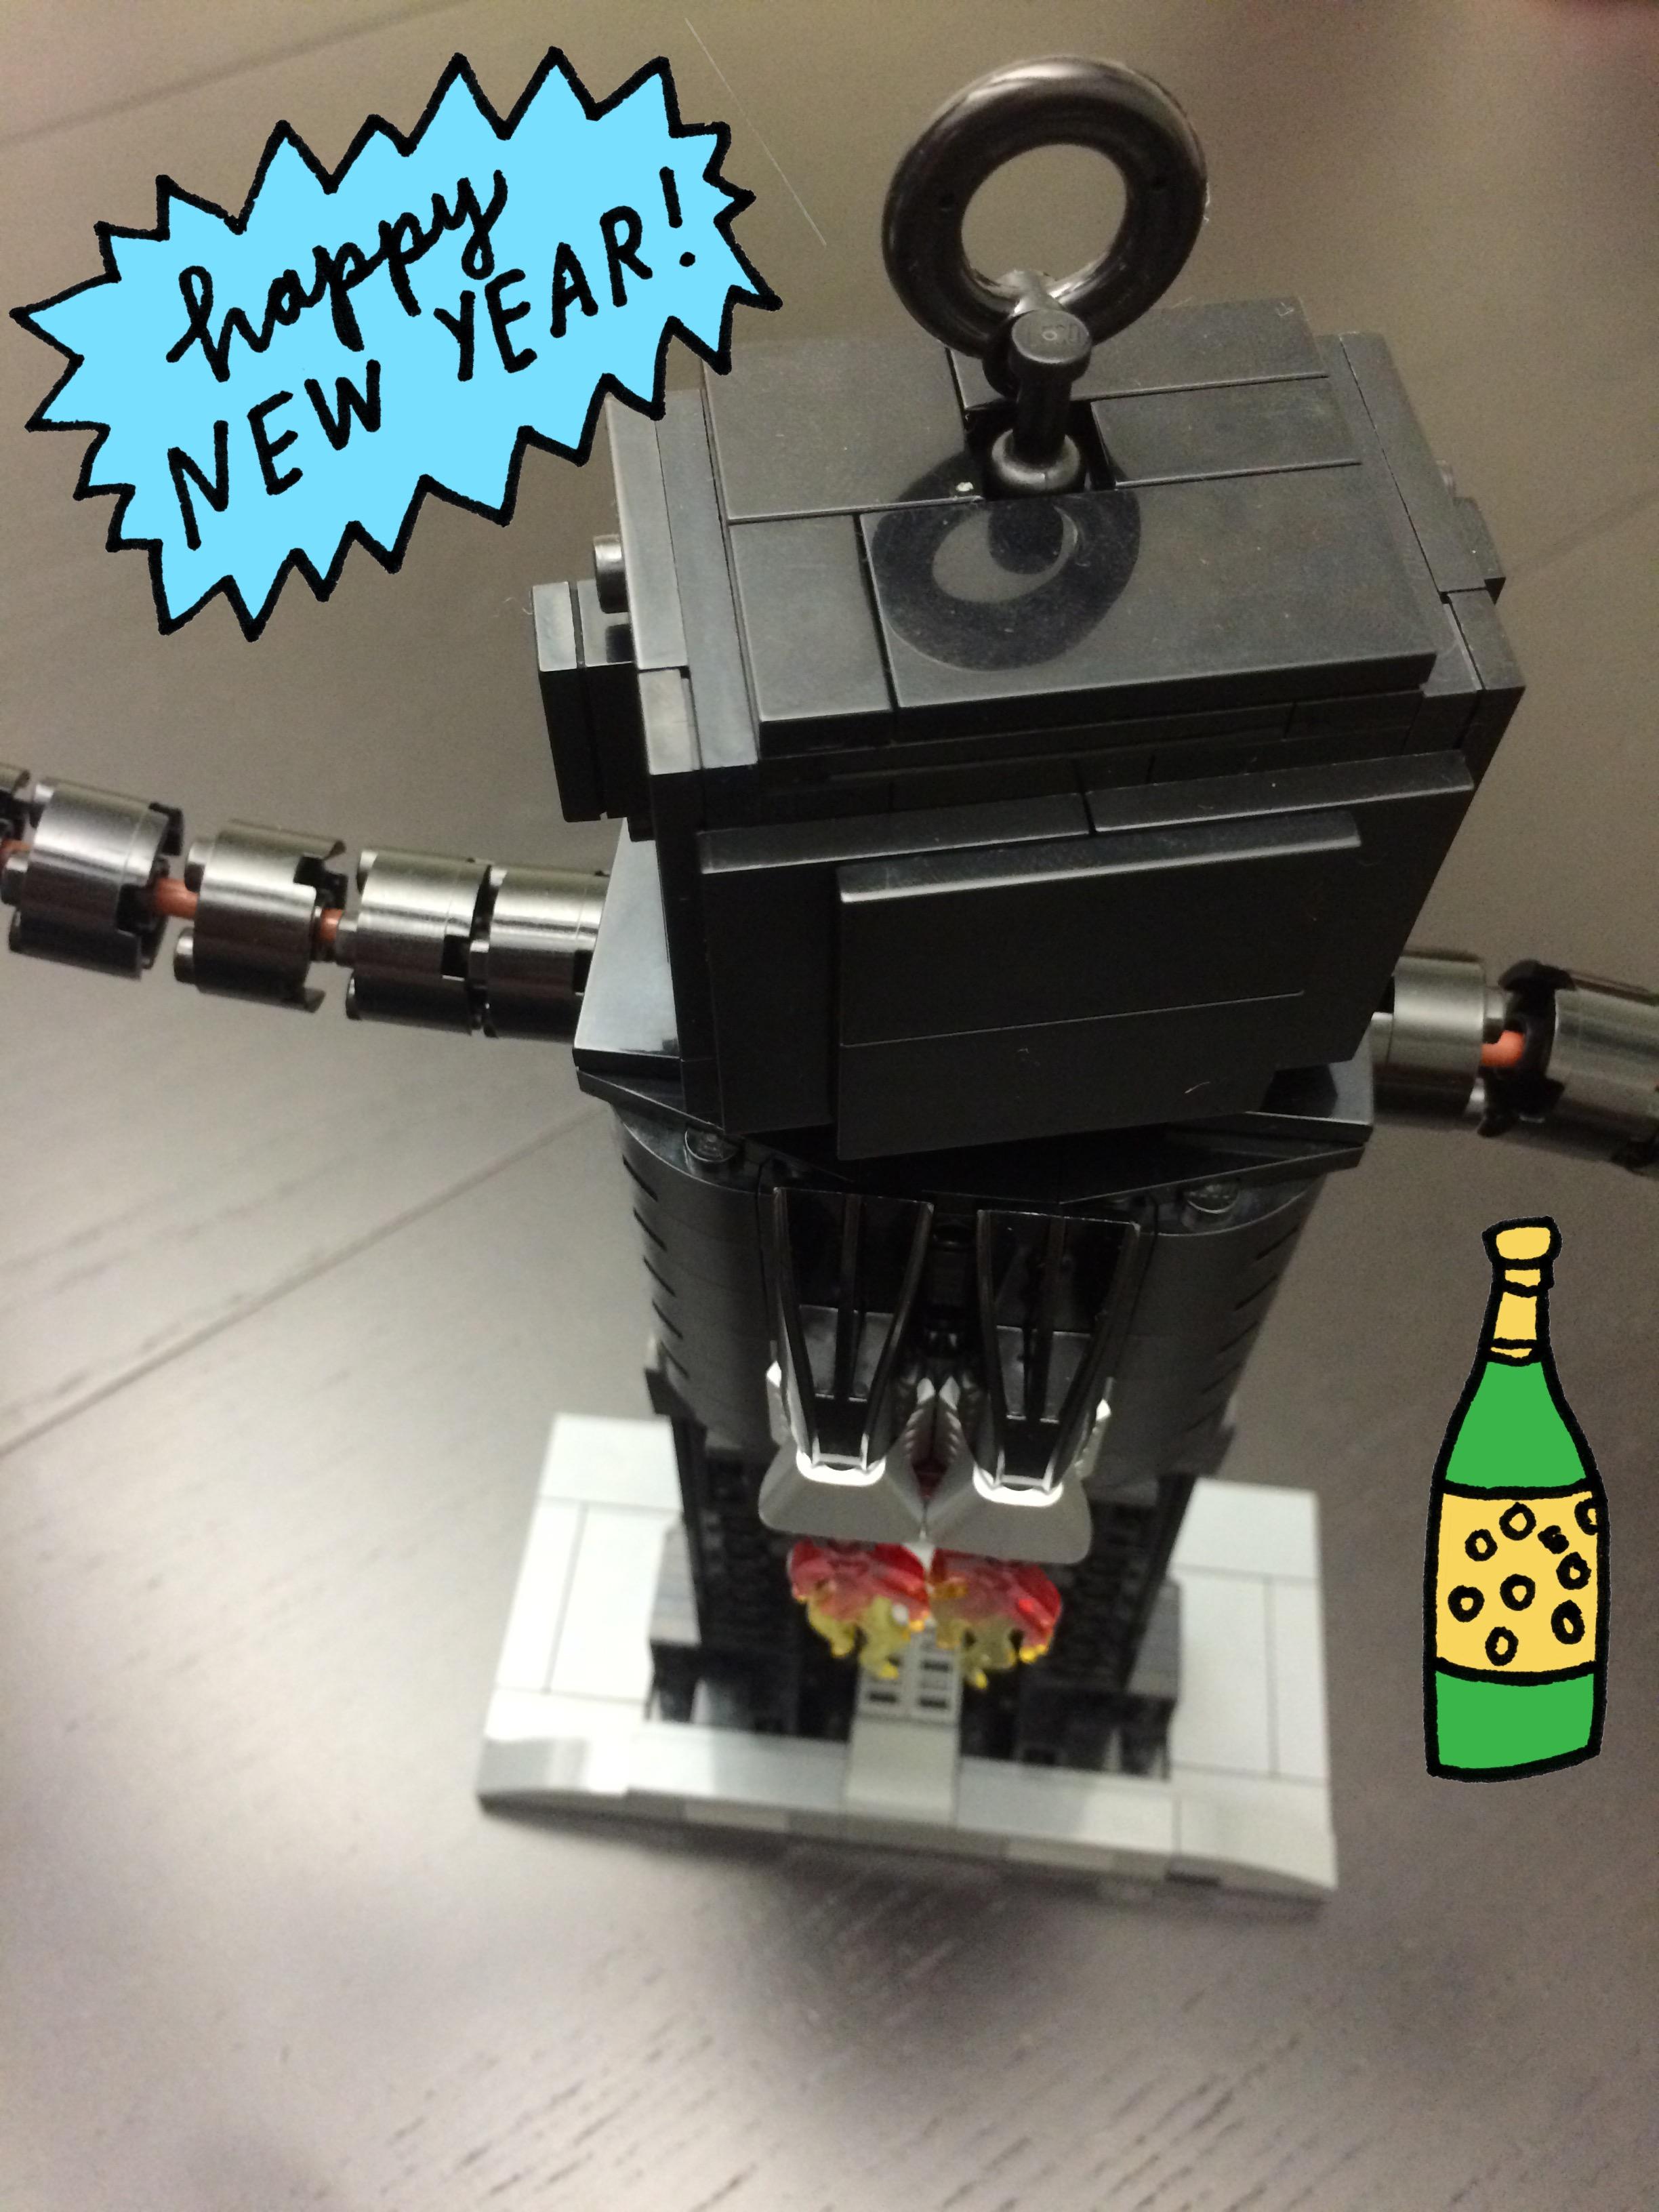 New Year Merle 2016